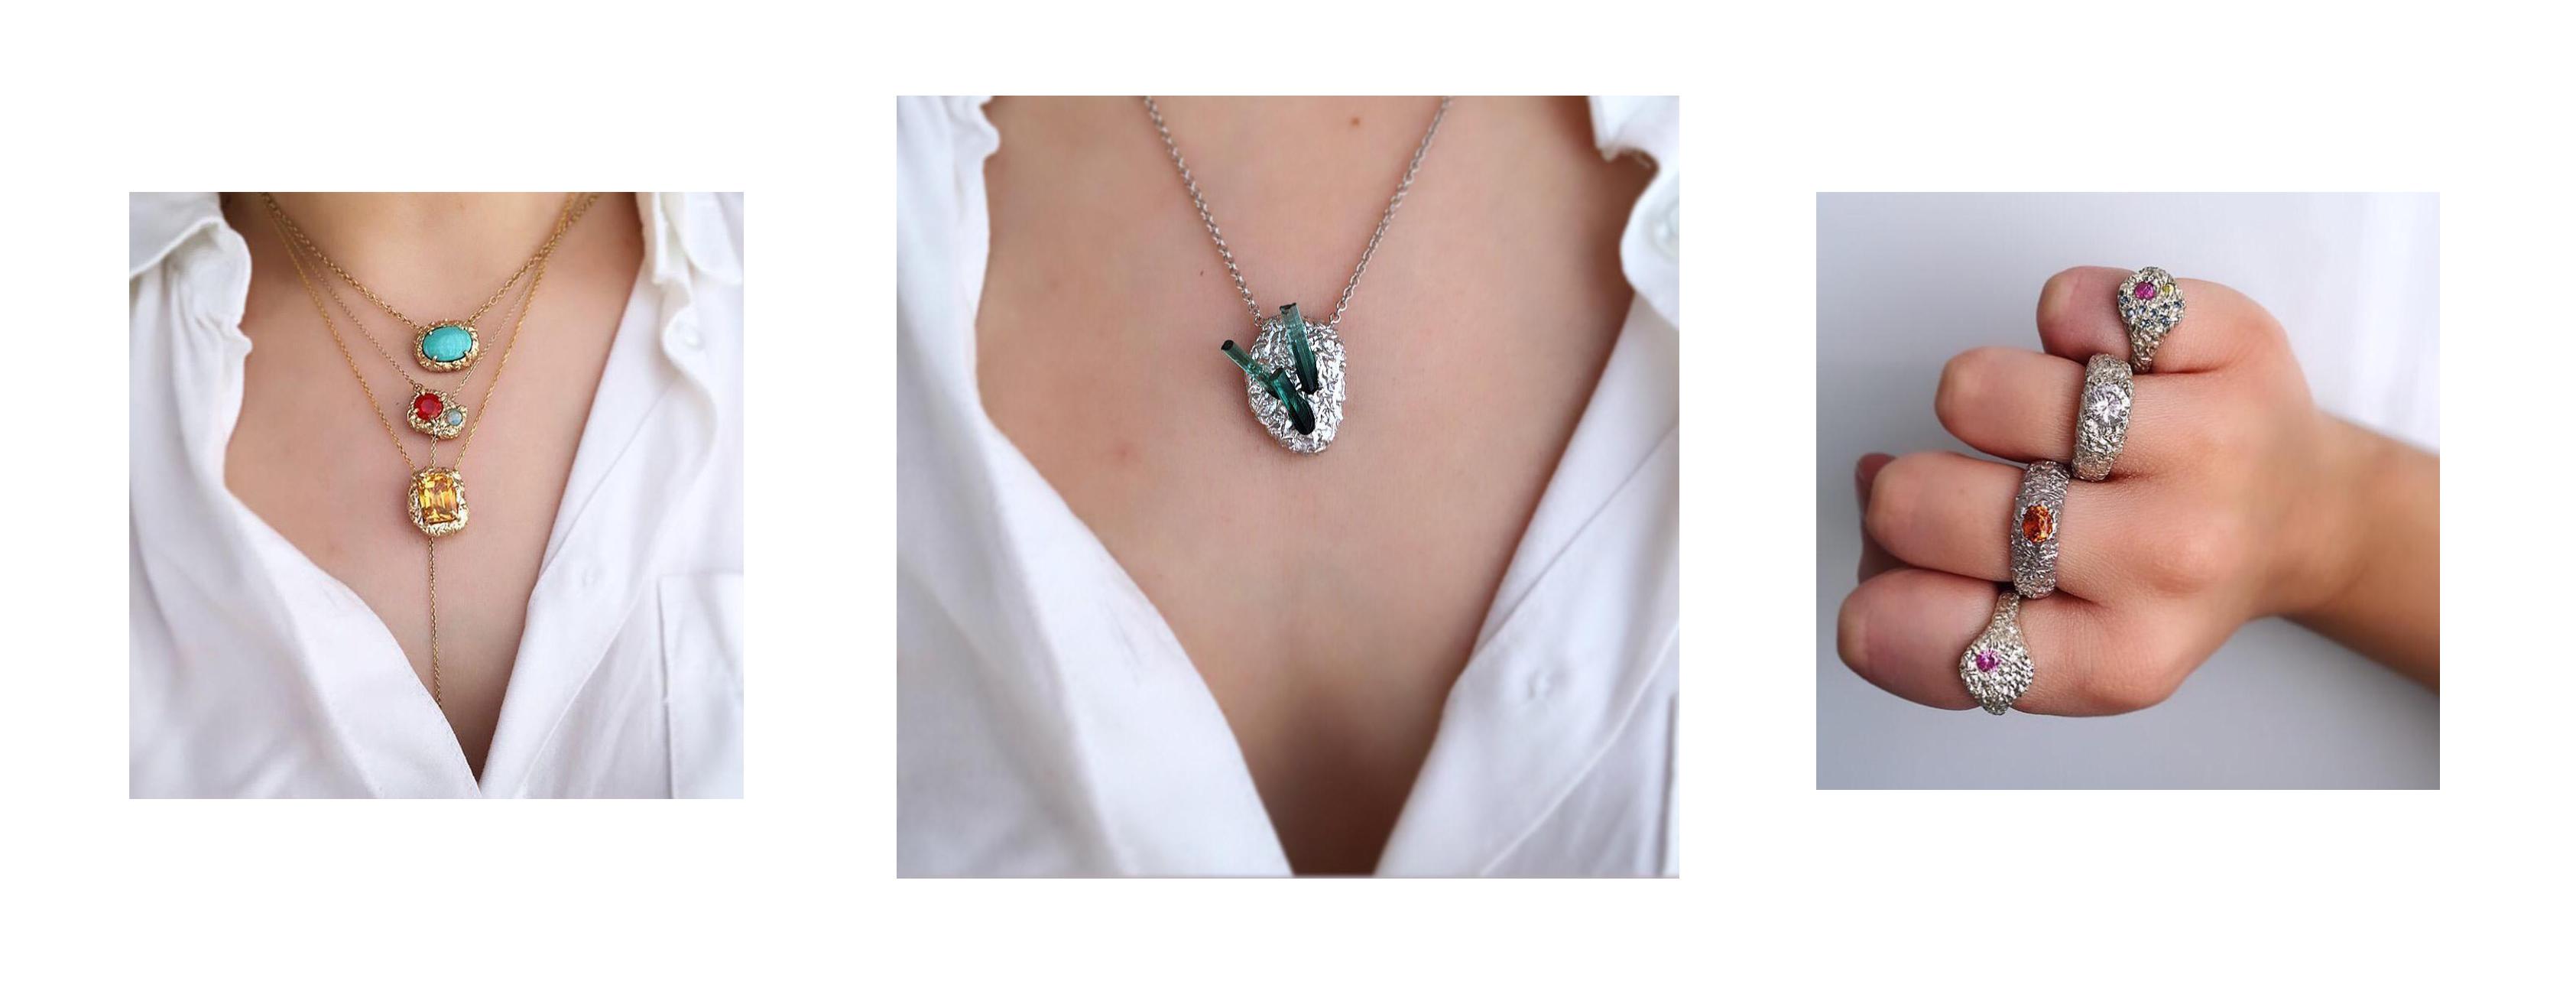 Susannah King Jewels